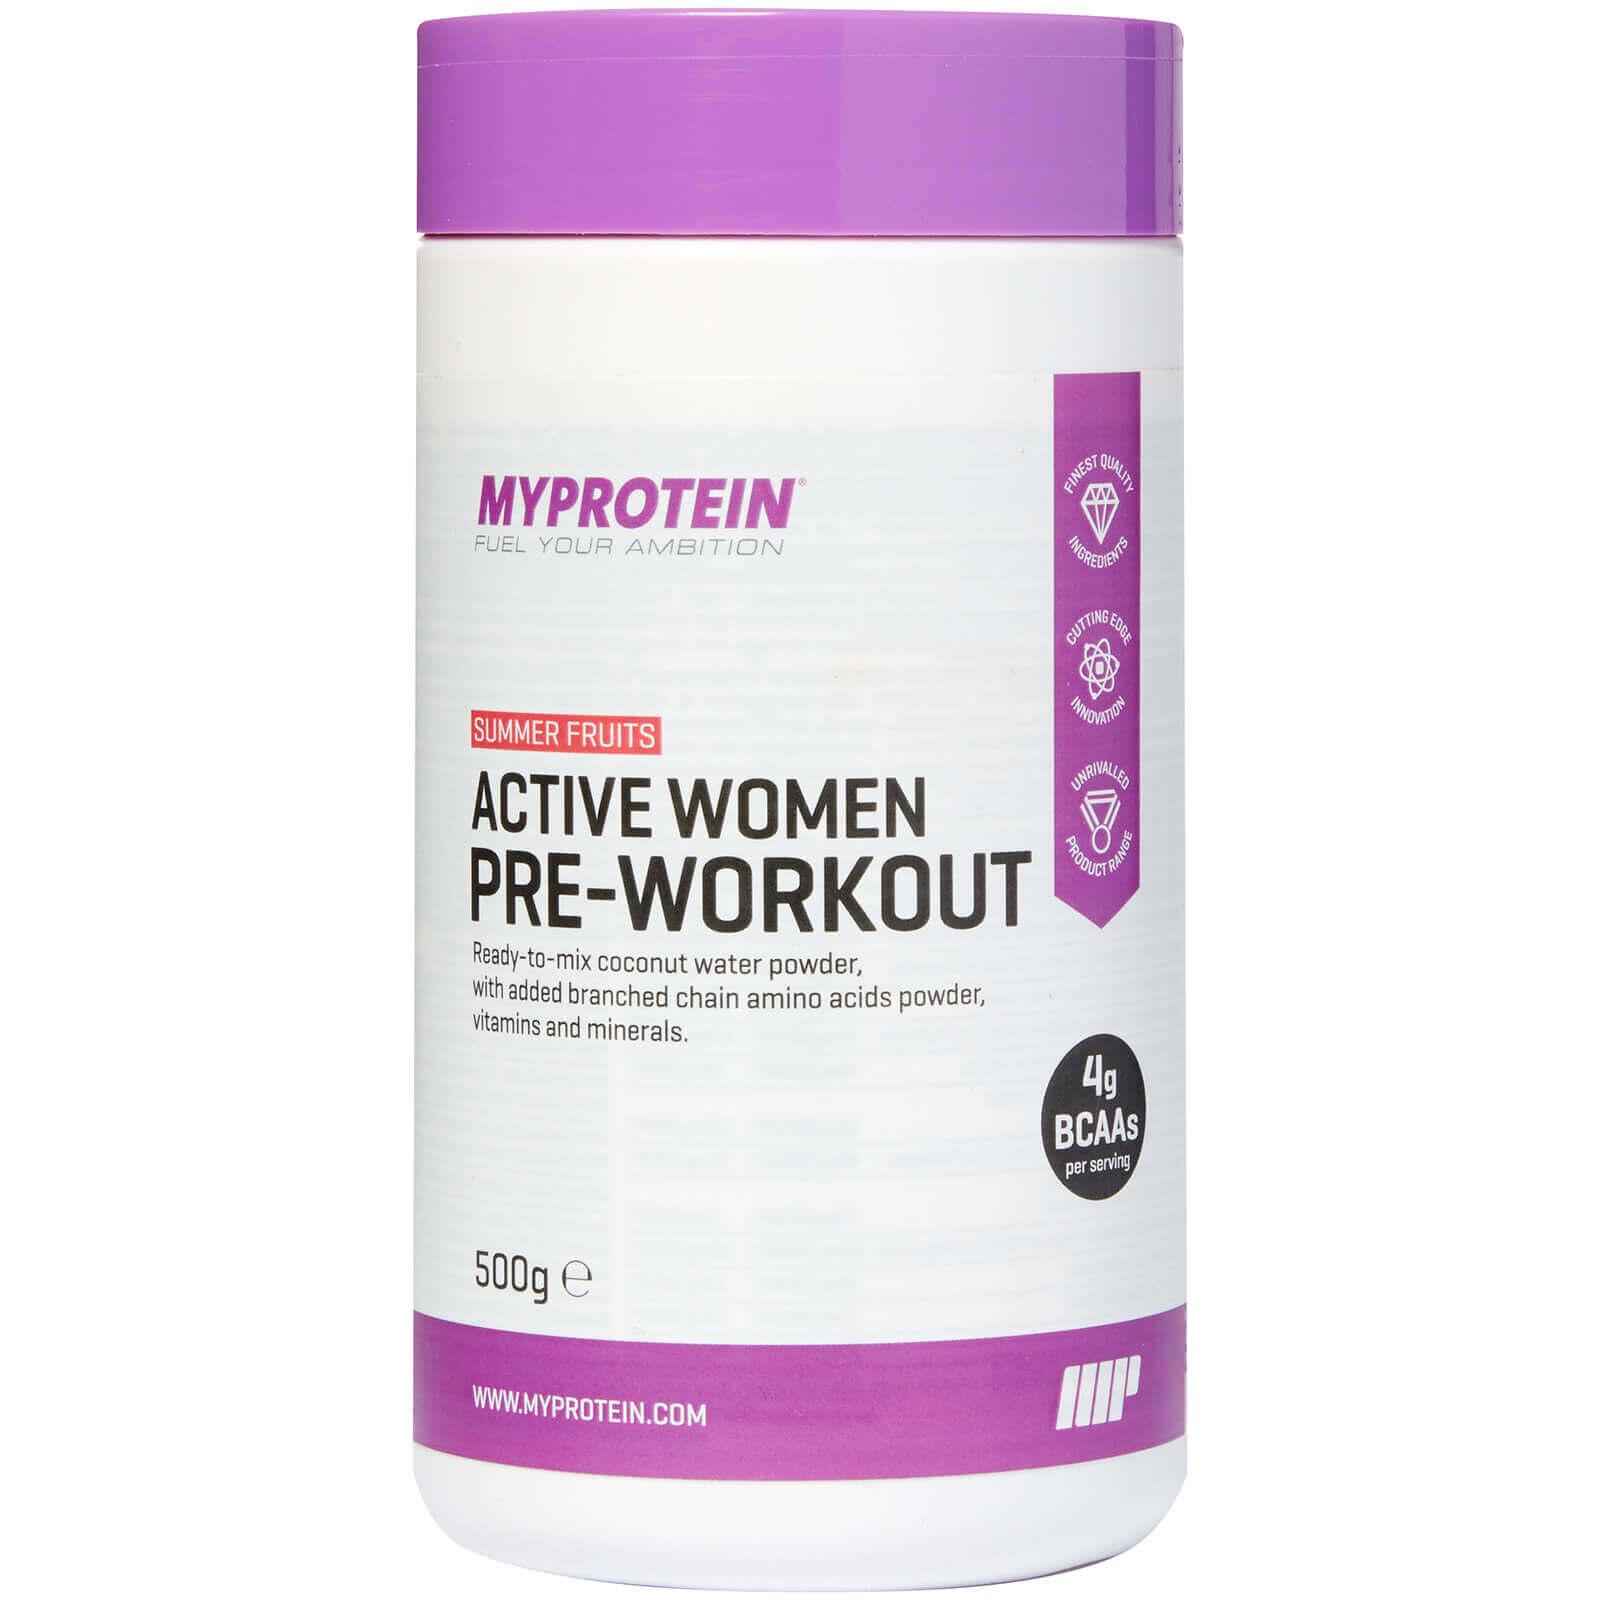 Active Women Pre-Workout™